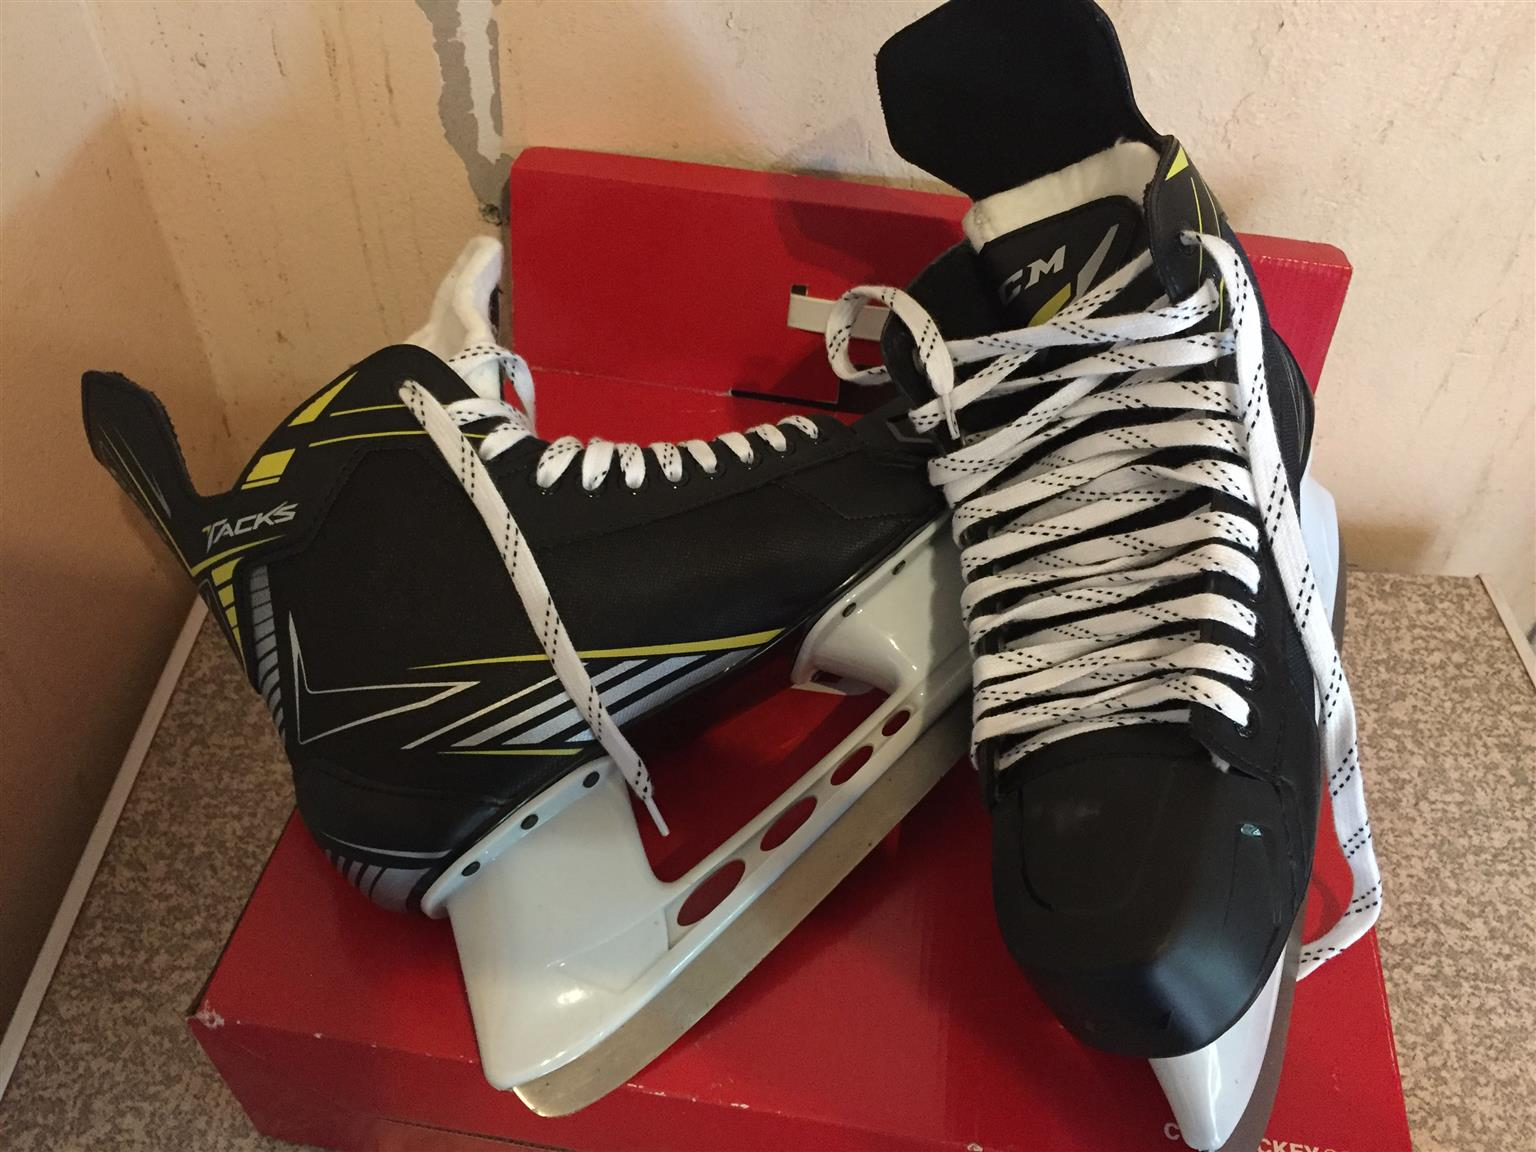 Size 11 CCM Tacks Ice Skates for sale